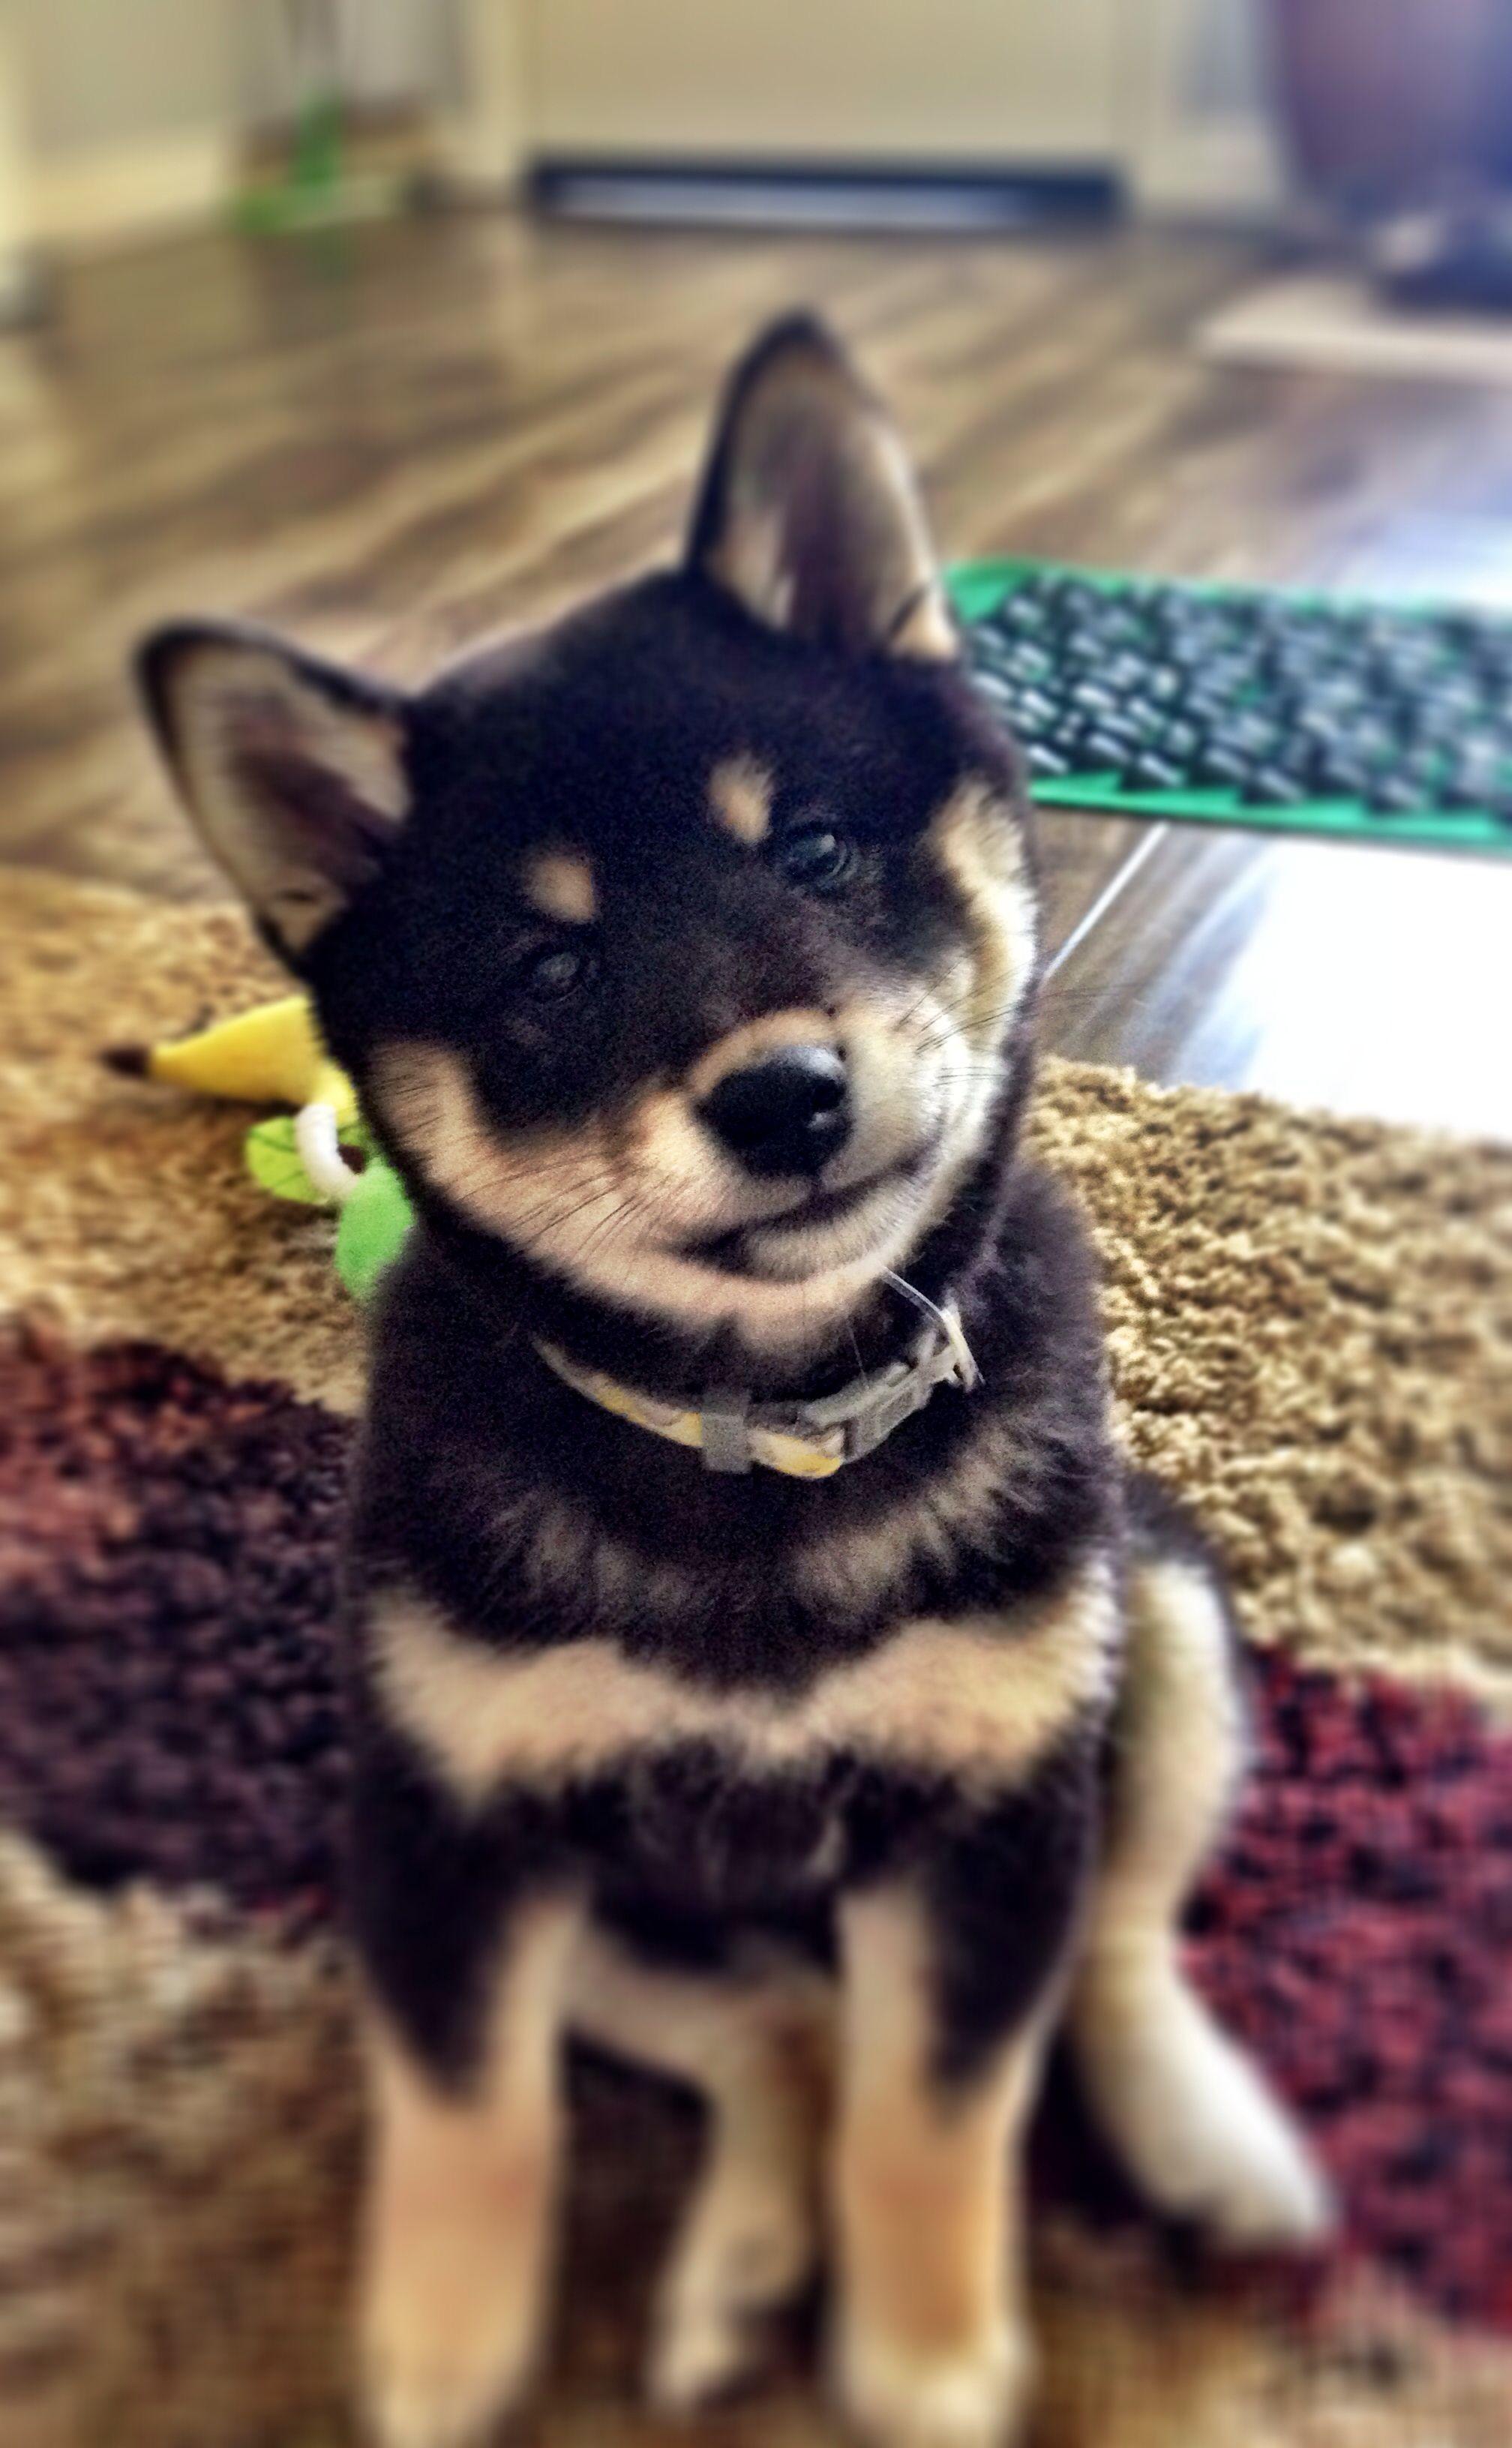 Shiba Inu Puppy 11 Weeks Black And Tan Shiba Inu Puppy Shiba Inu Shiba Inu Dog